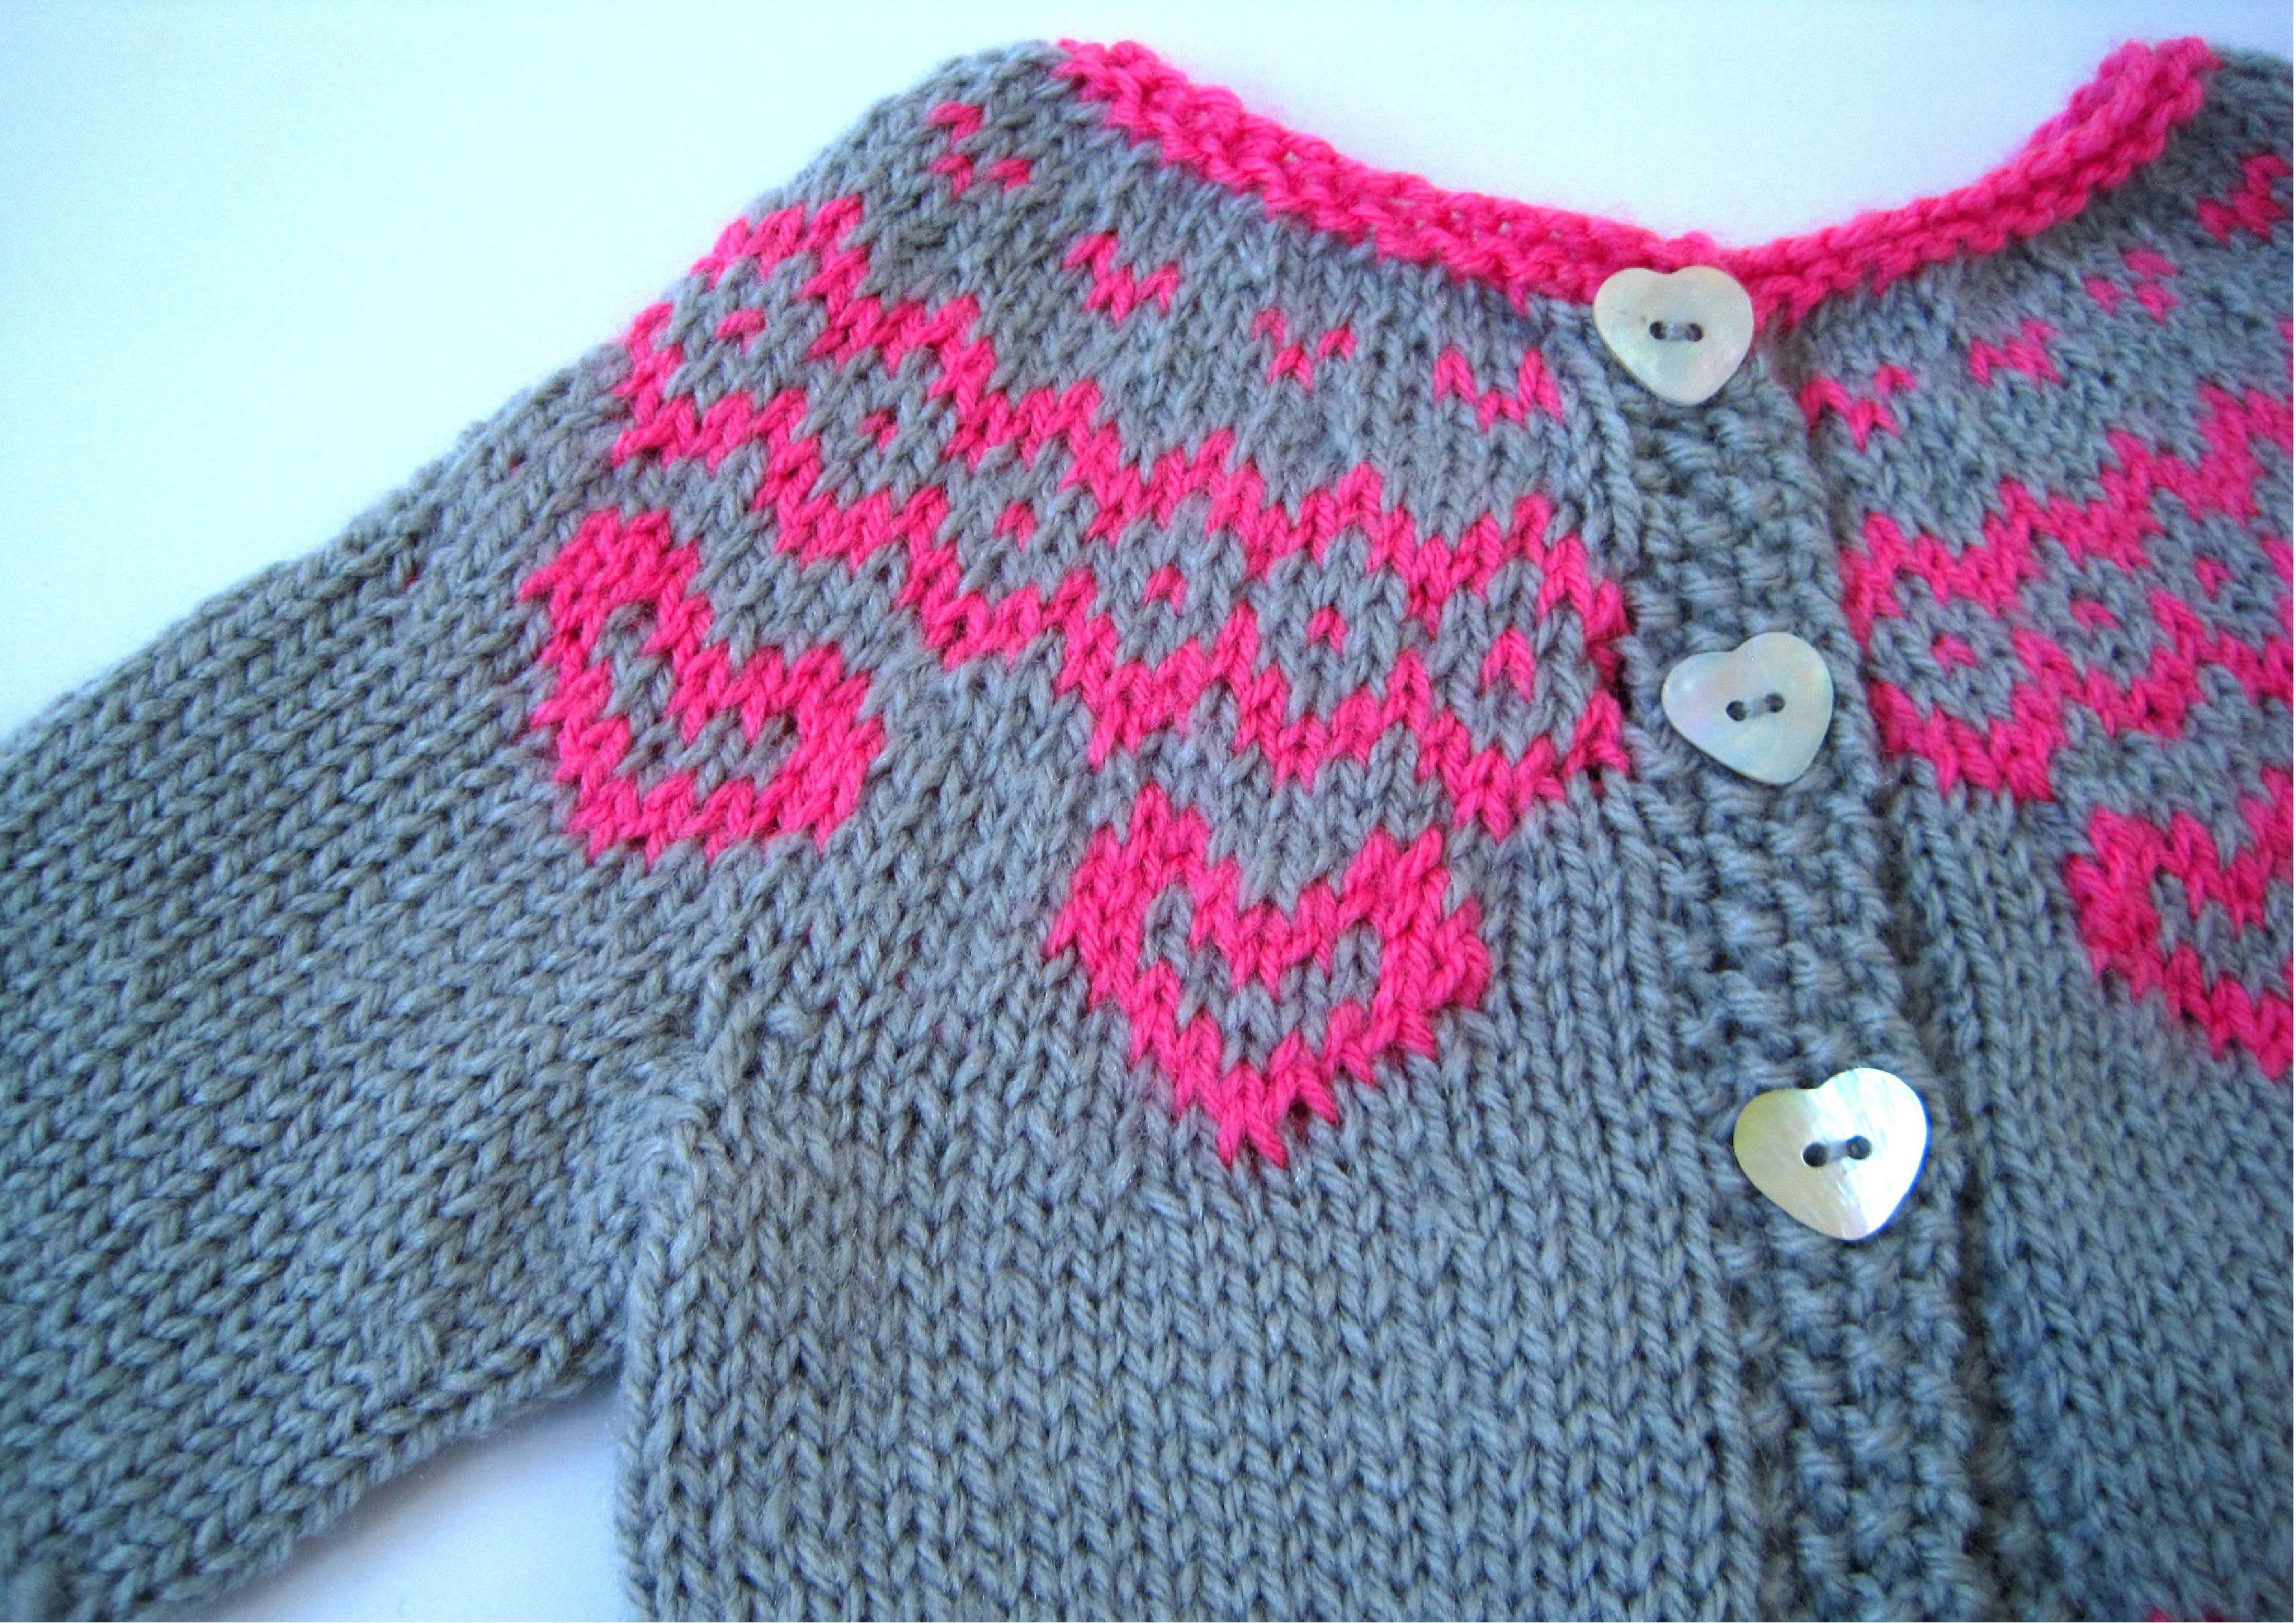 Yoke close up of heidi cardigan cardi sweater knitting pattern by yoke close up of heidi cardigan cardi sweater knitting pattern by suzie sparkles newborn baby to bankloansurffo Images